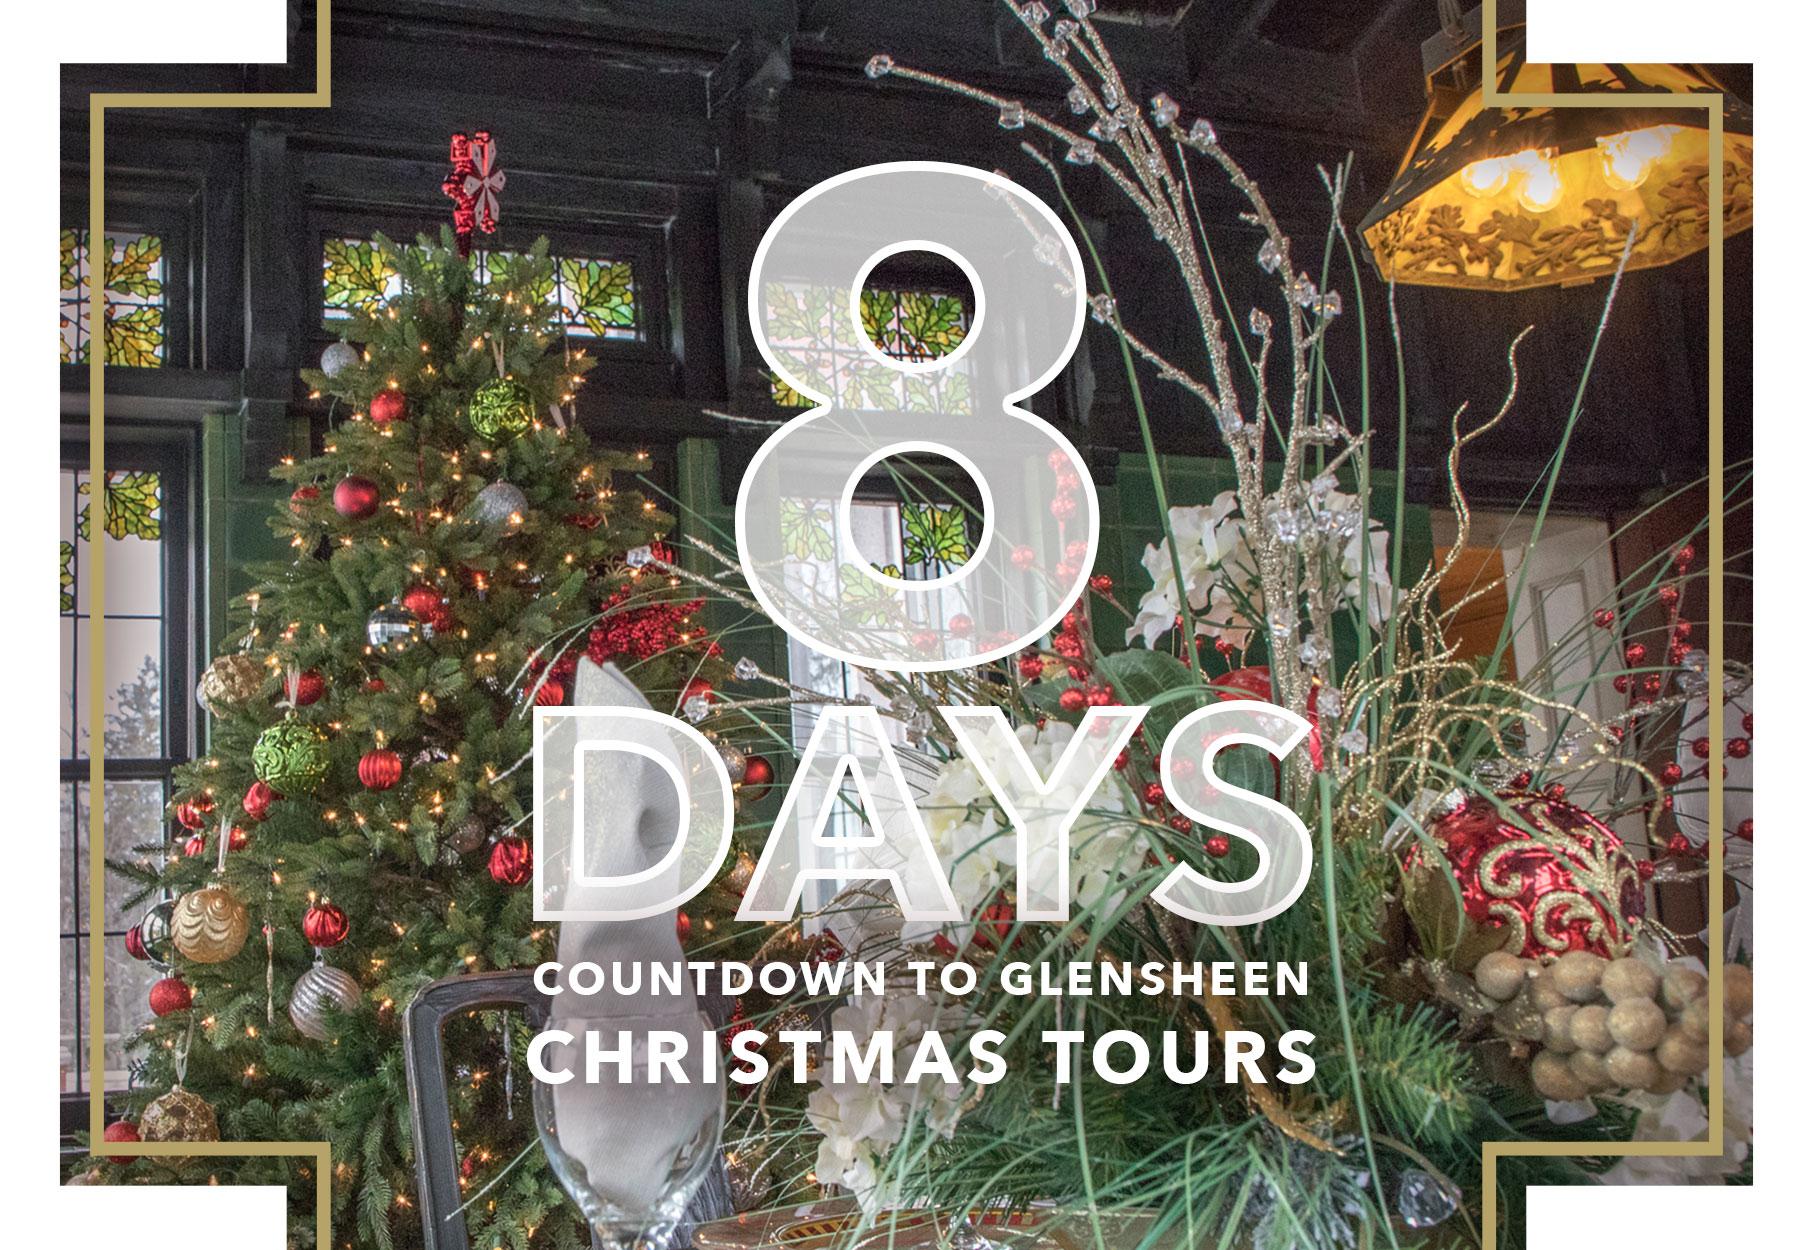 Until Christmas 10 Weeks Till Christmas.8 Days Until Christmas Tours Glensheen